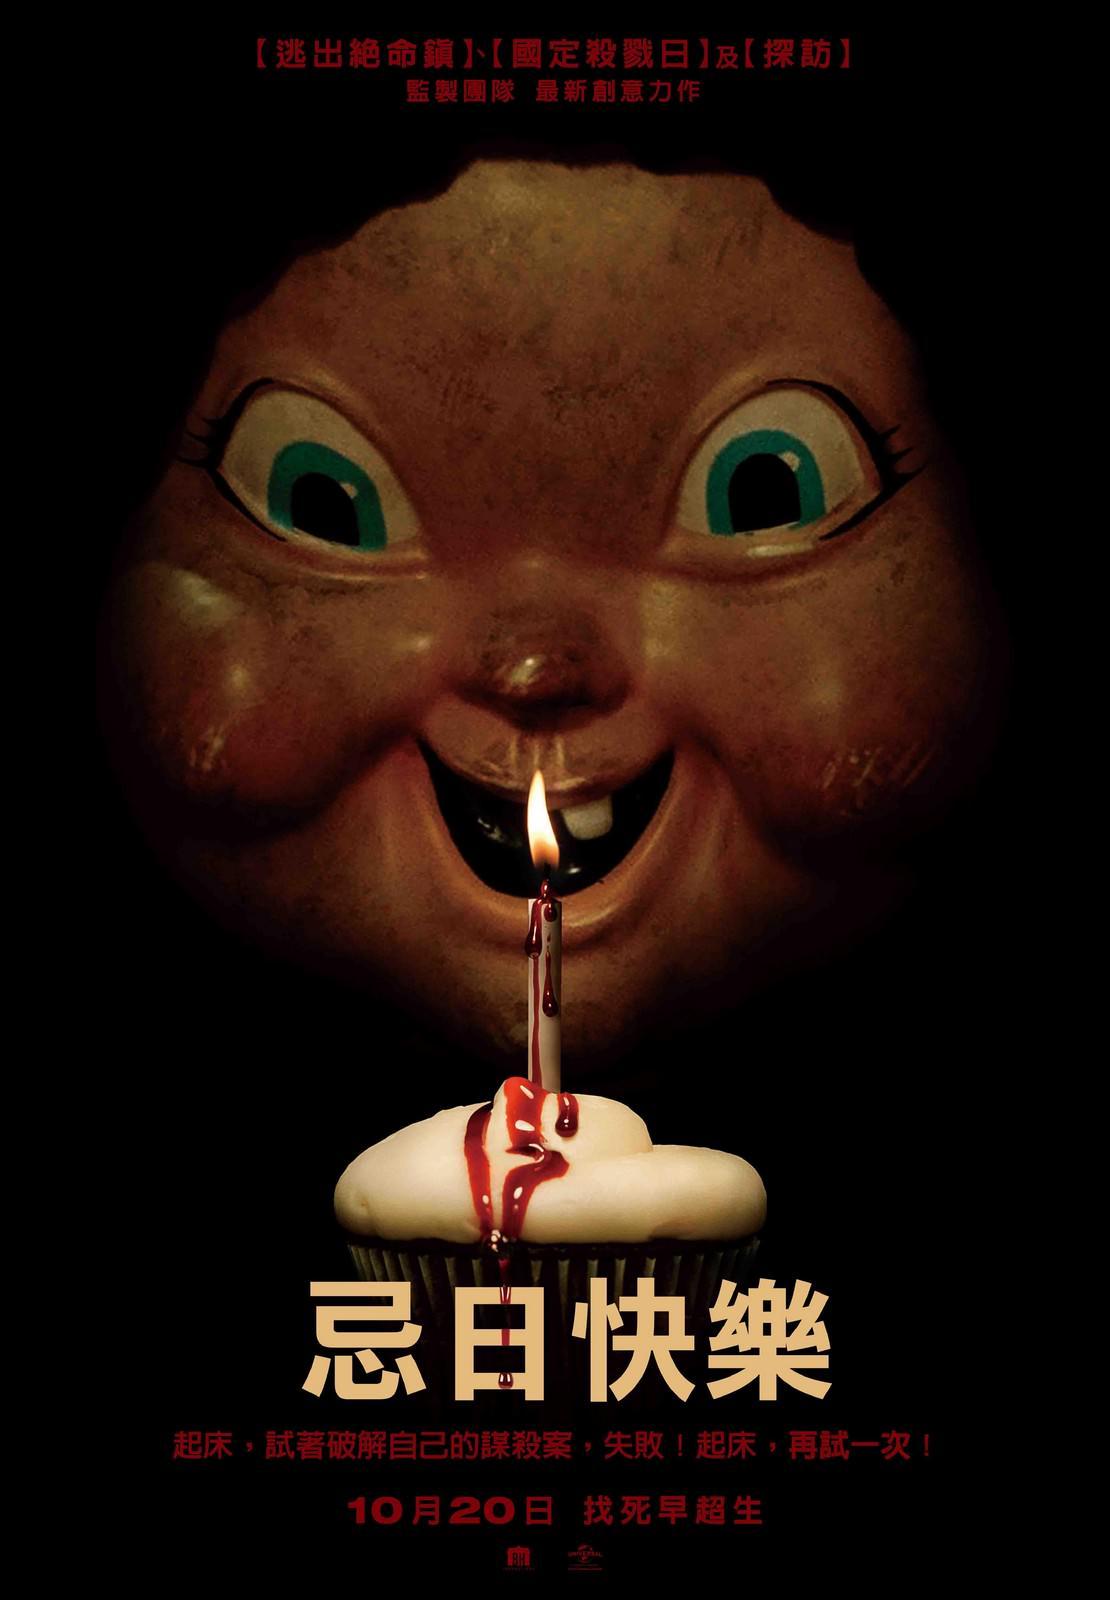 Movie, Happy Death Day(美國, 2017年) / 忌日快樂(台灣) / 忌日快乐(中國) / 死亡無限LOOP(香港), 電影海報, 台灣